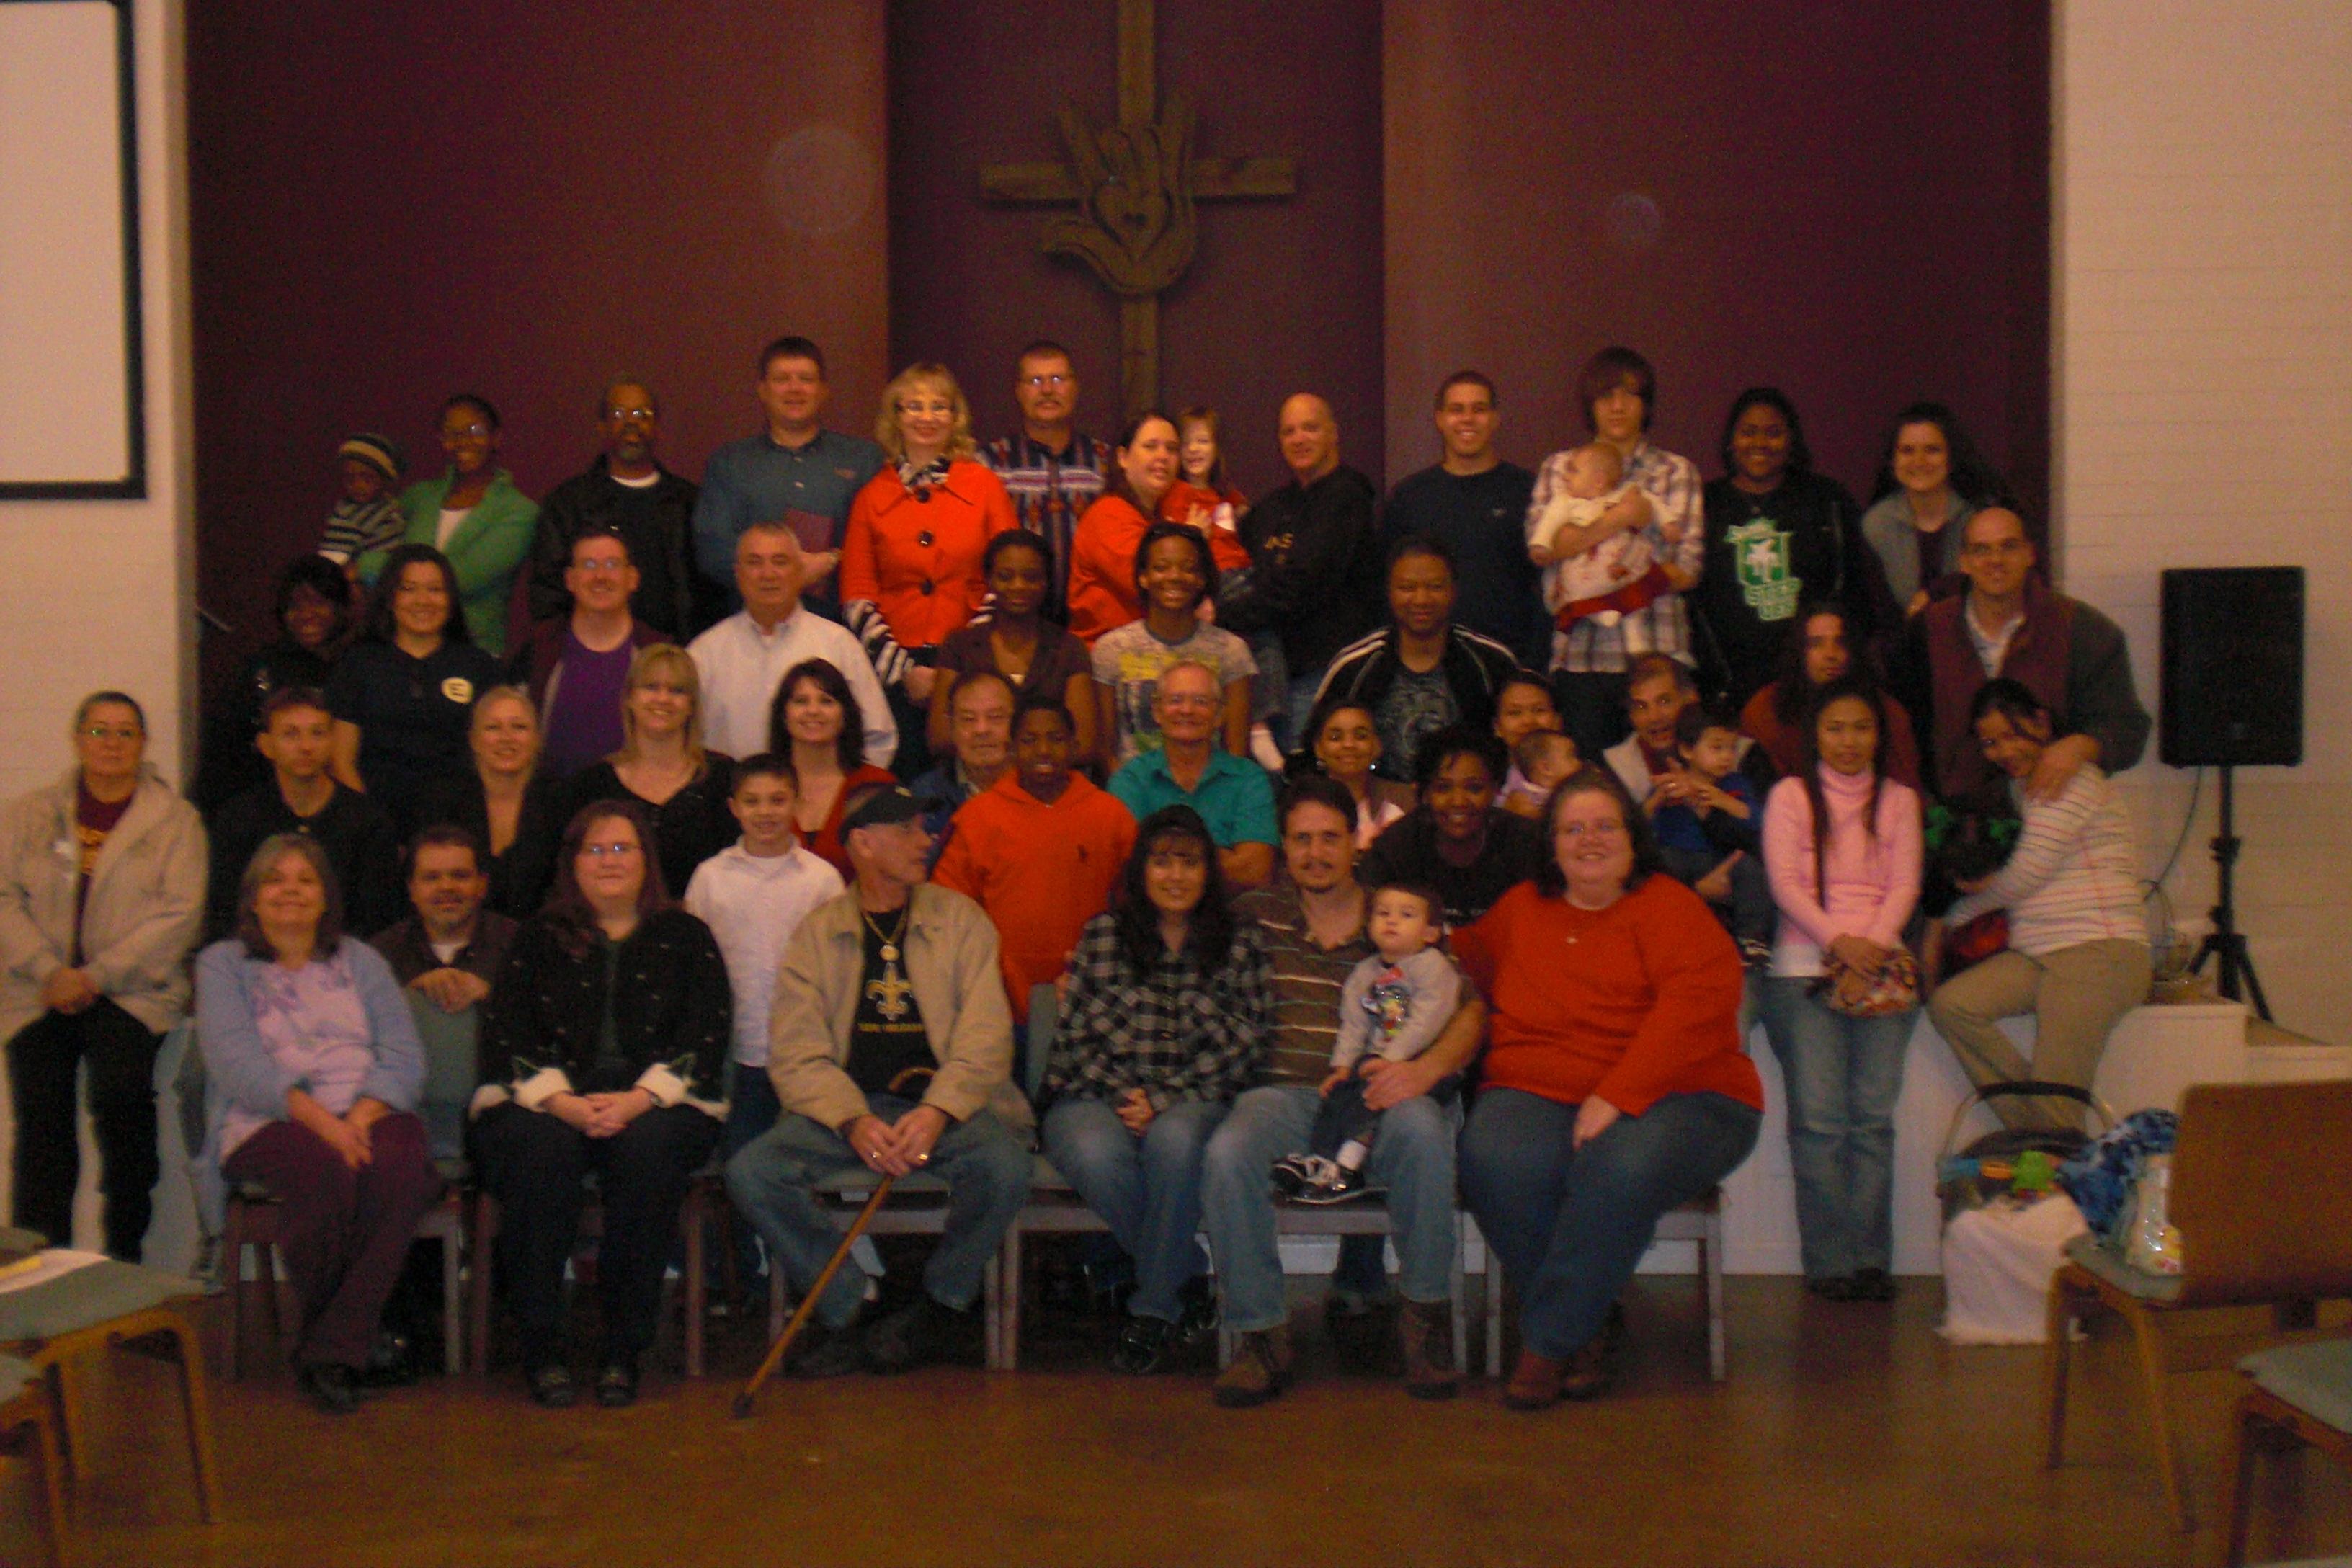 Christmas Service at the Deaf Church